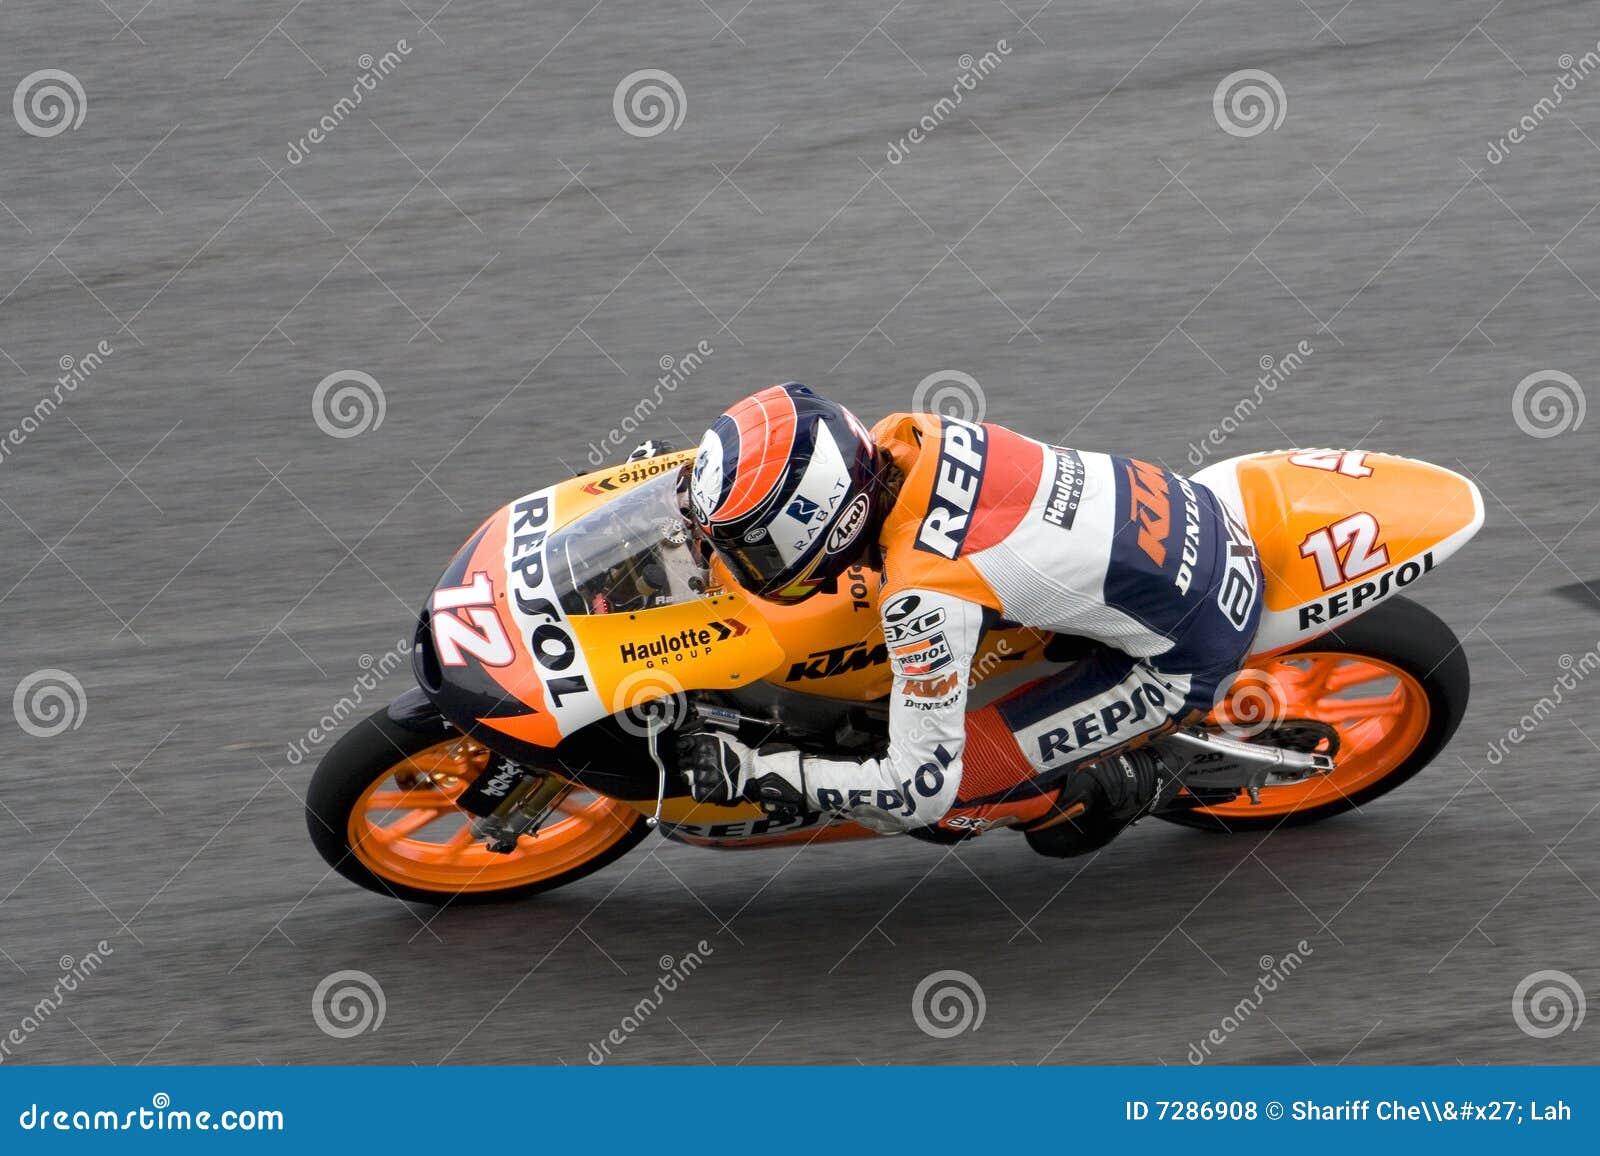 Motogp 125cc - Esteve Rabat